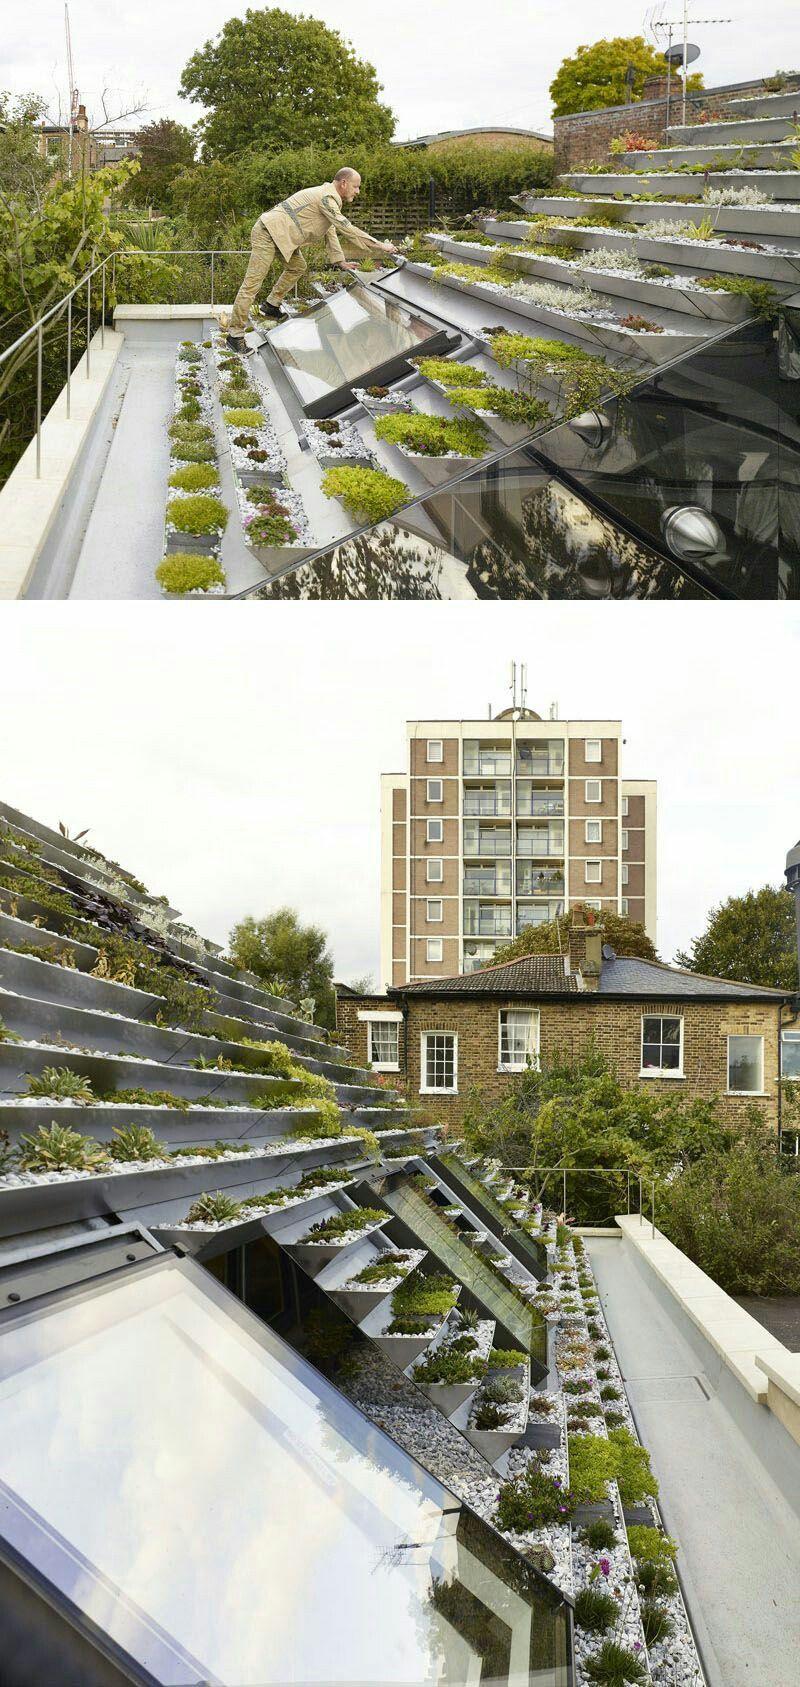 30 Terrace Gardening Design Inspiration Roof Garden Green Roof Green Roof Building